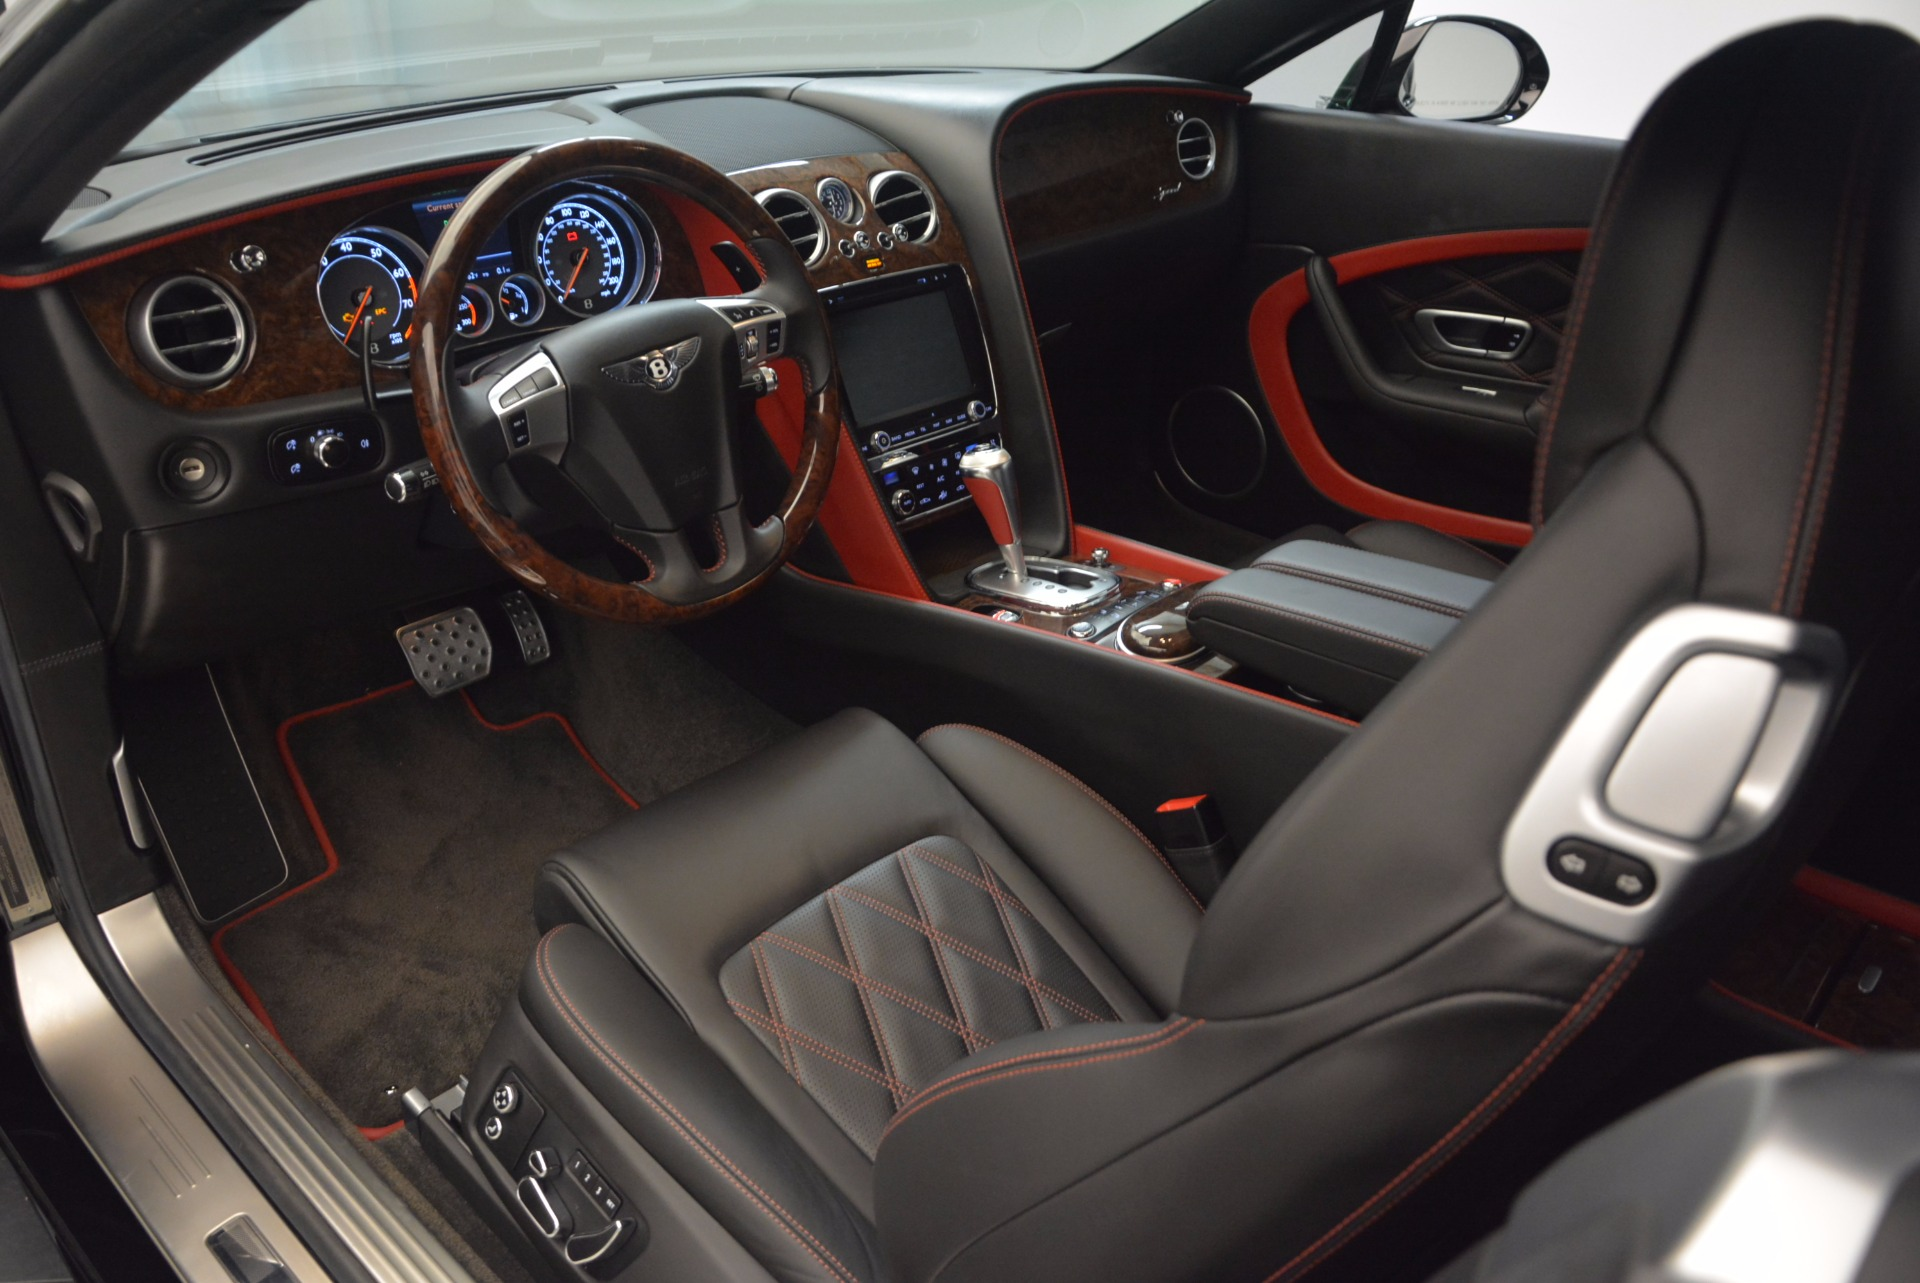 Used 2015 Bentley Continental GT Speed For Sale In Westport, CT 1646_p22